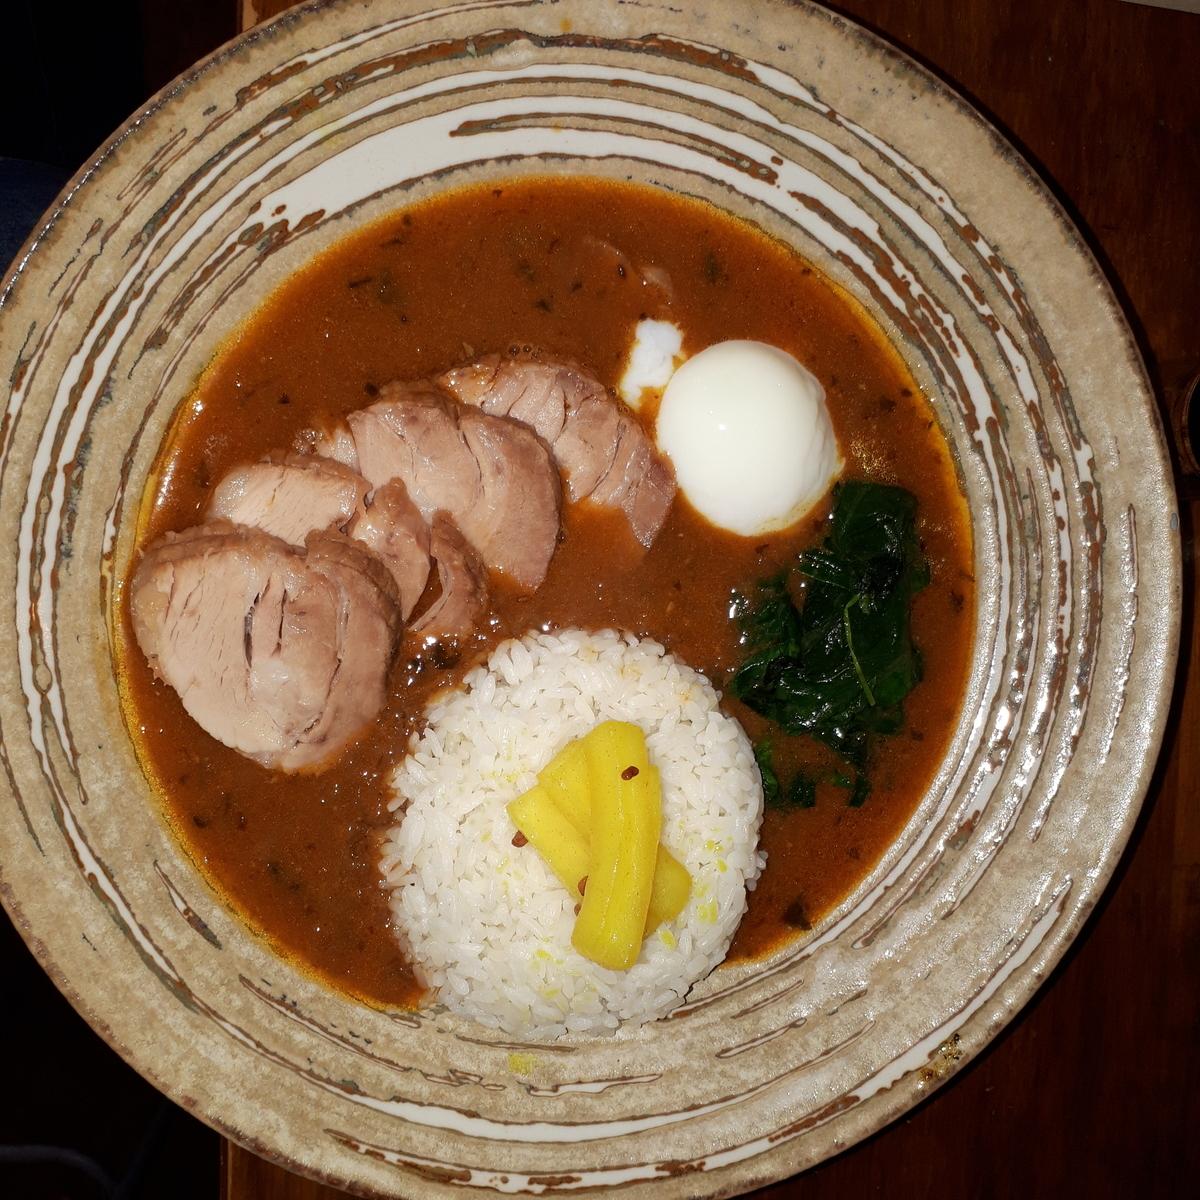 wacca  2019年3月22日 濃厚豚骨出汁の大阪スープカレー